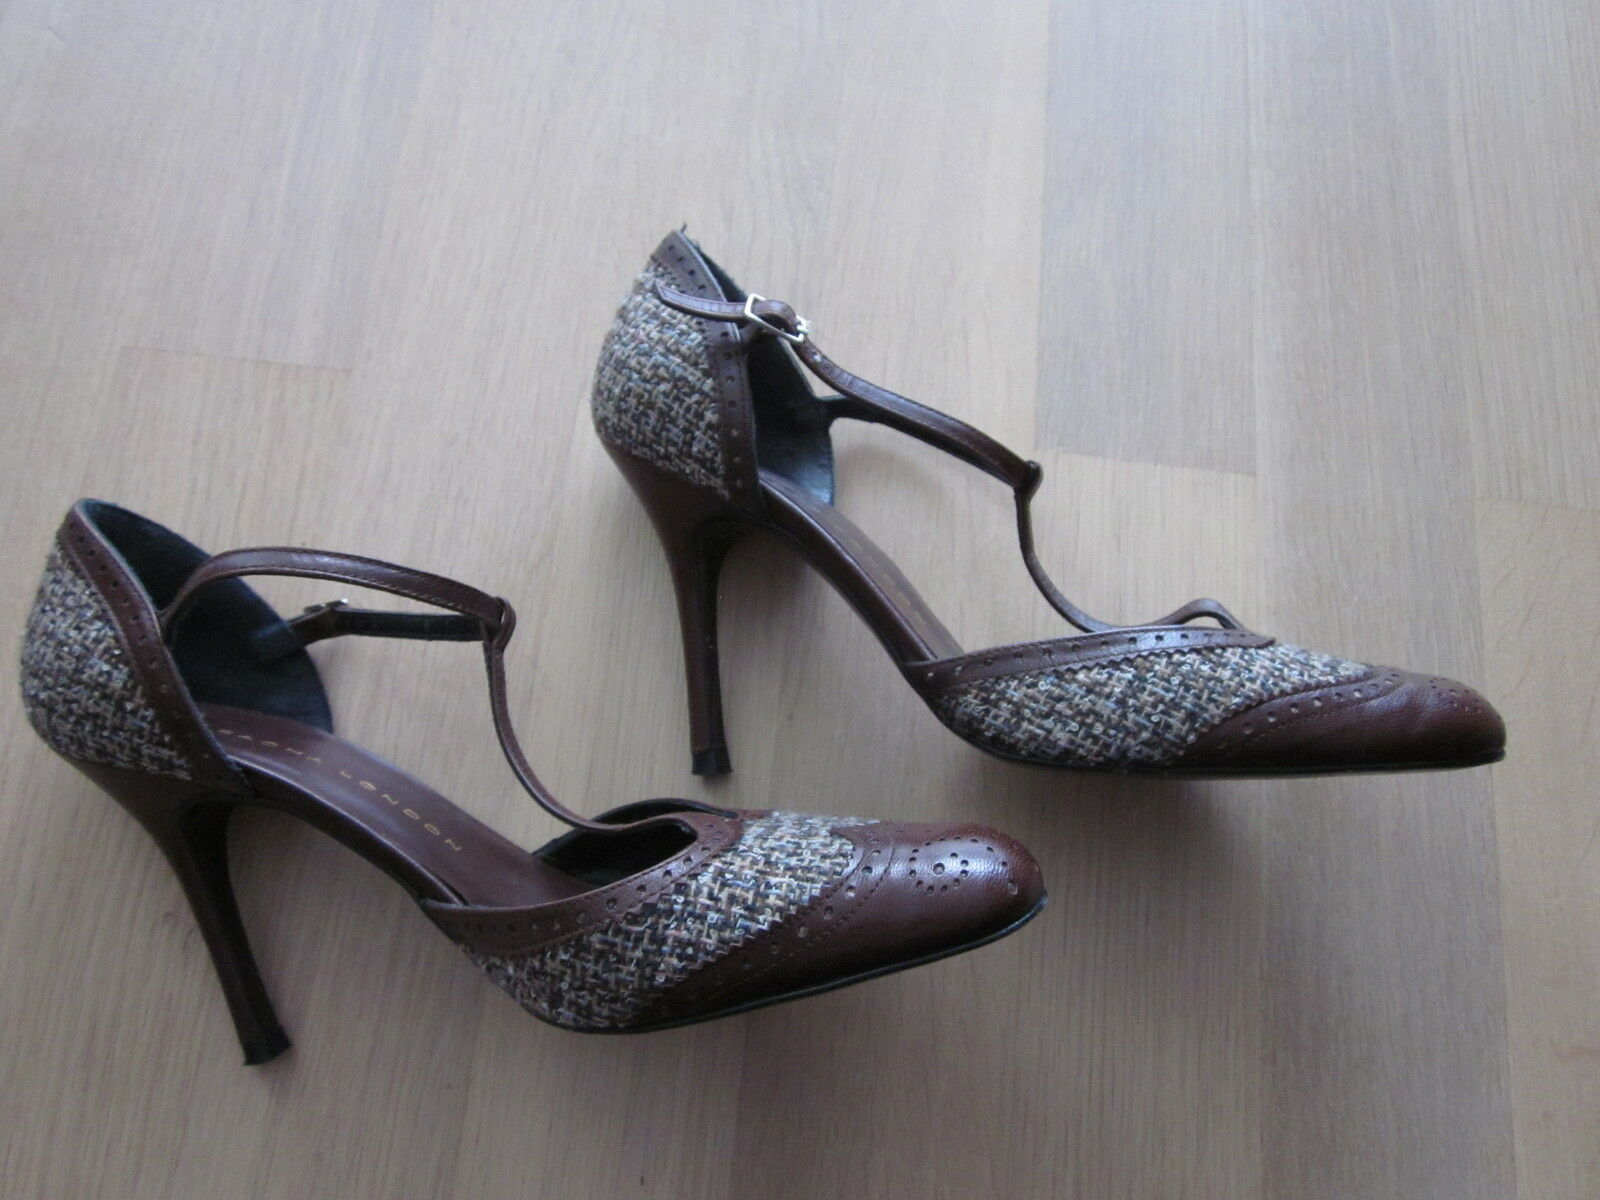 Fesselriemchen Pumps, braun m Textileinsatz, Sacha London, 38, kaum getragen